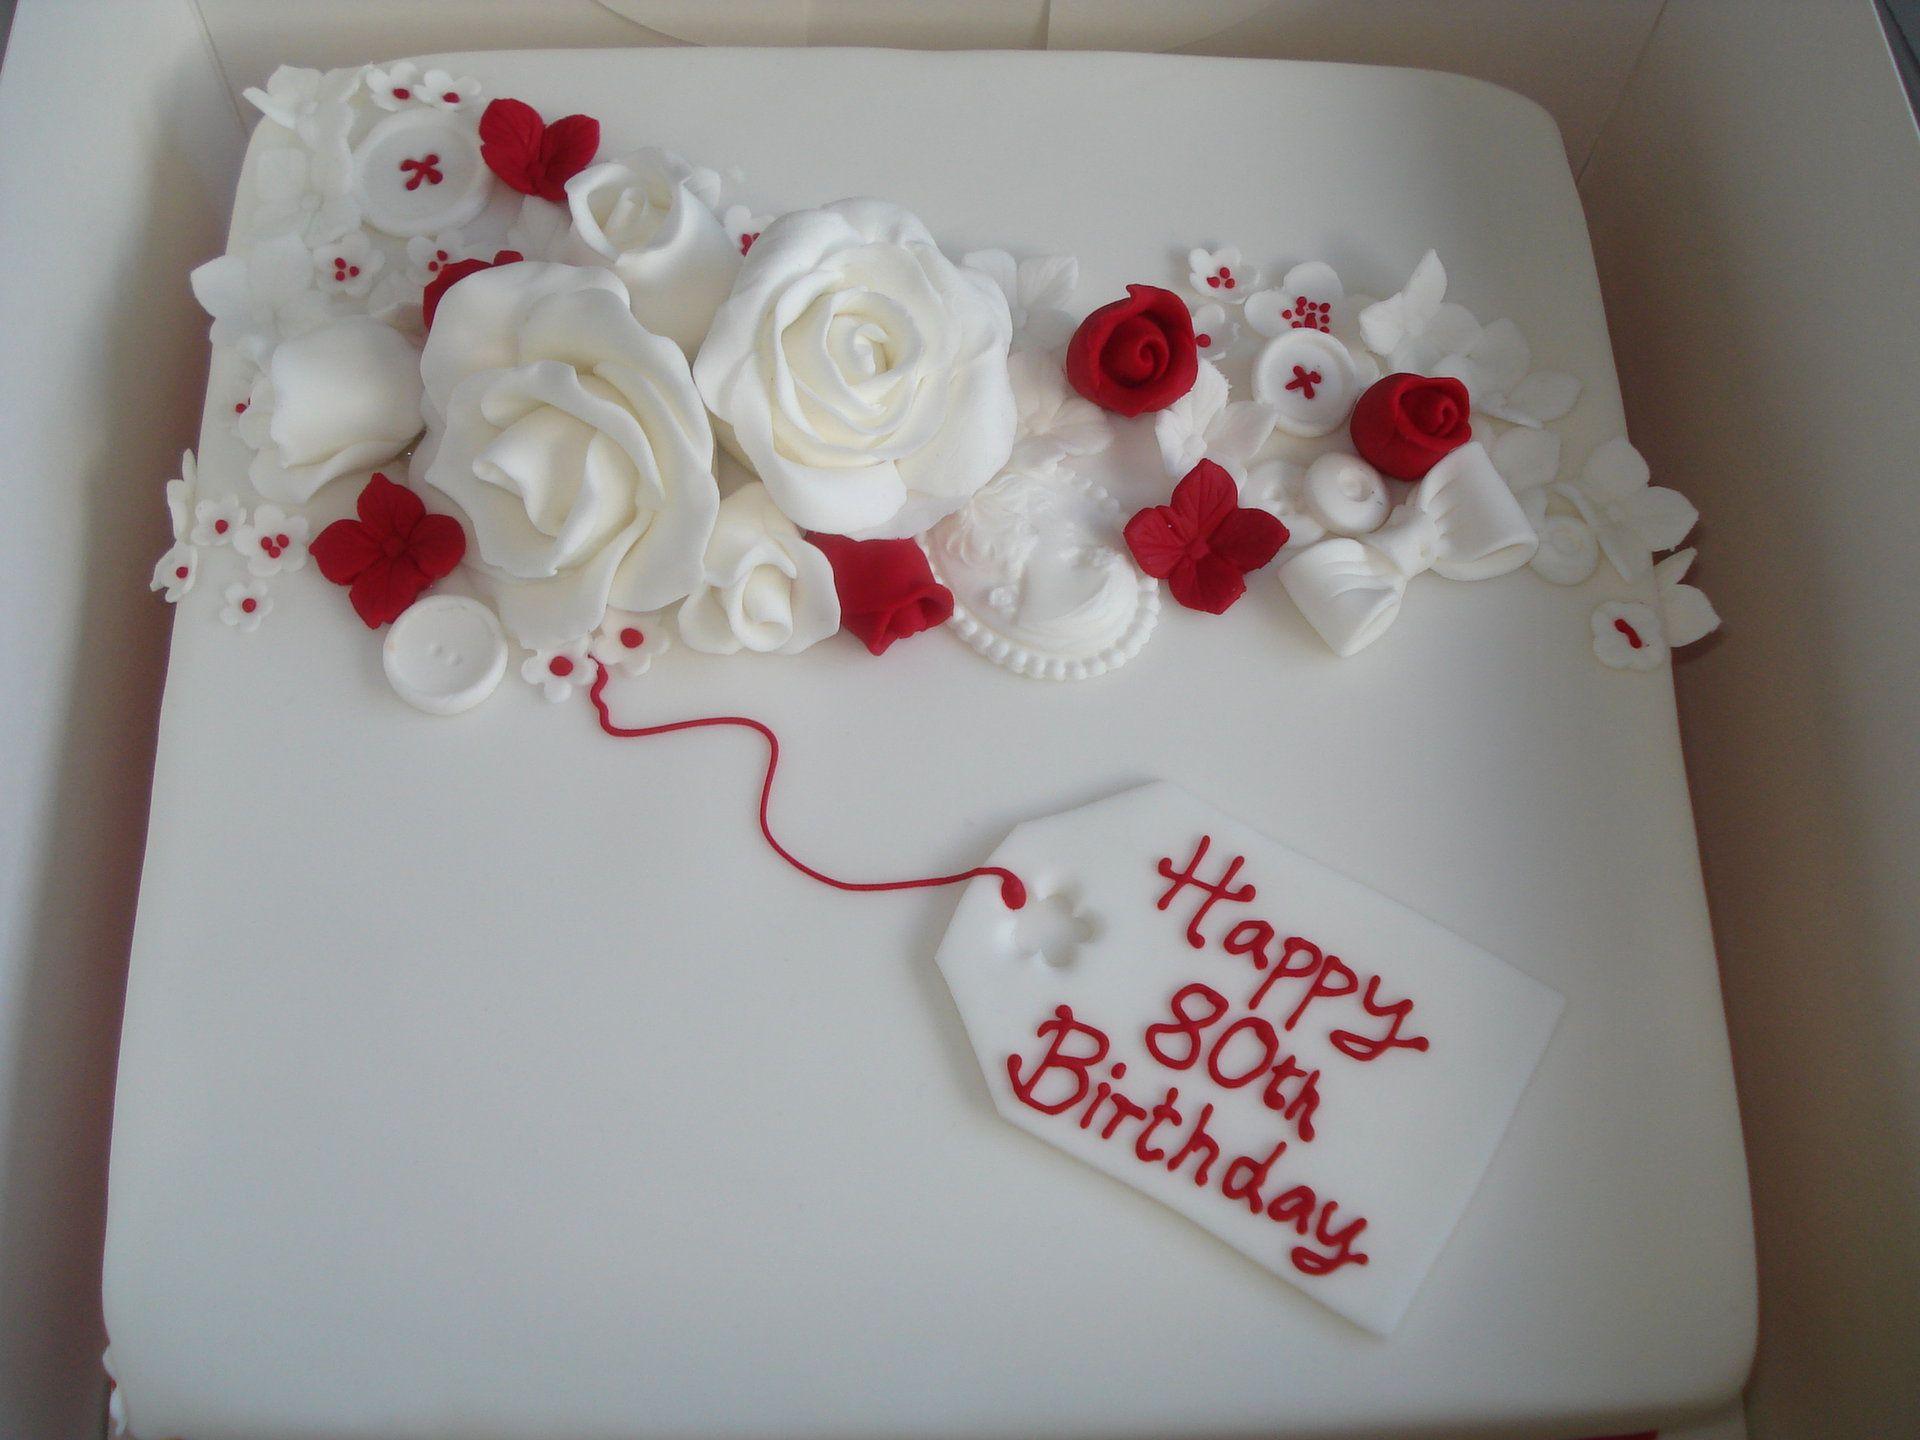 Cake Decorating 80th Birthday Ideas : Happy 80th Birthday Cake Cake ideas  Pinterest 80th ...